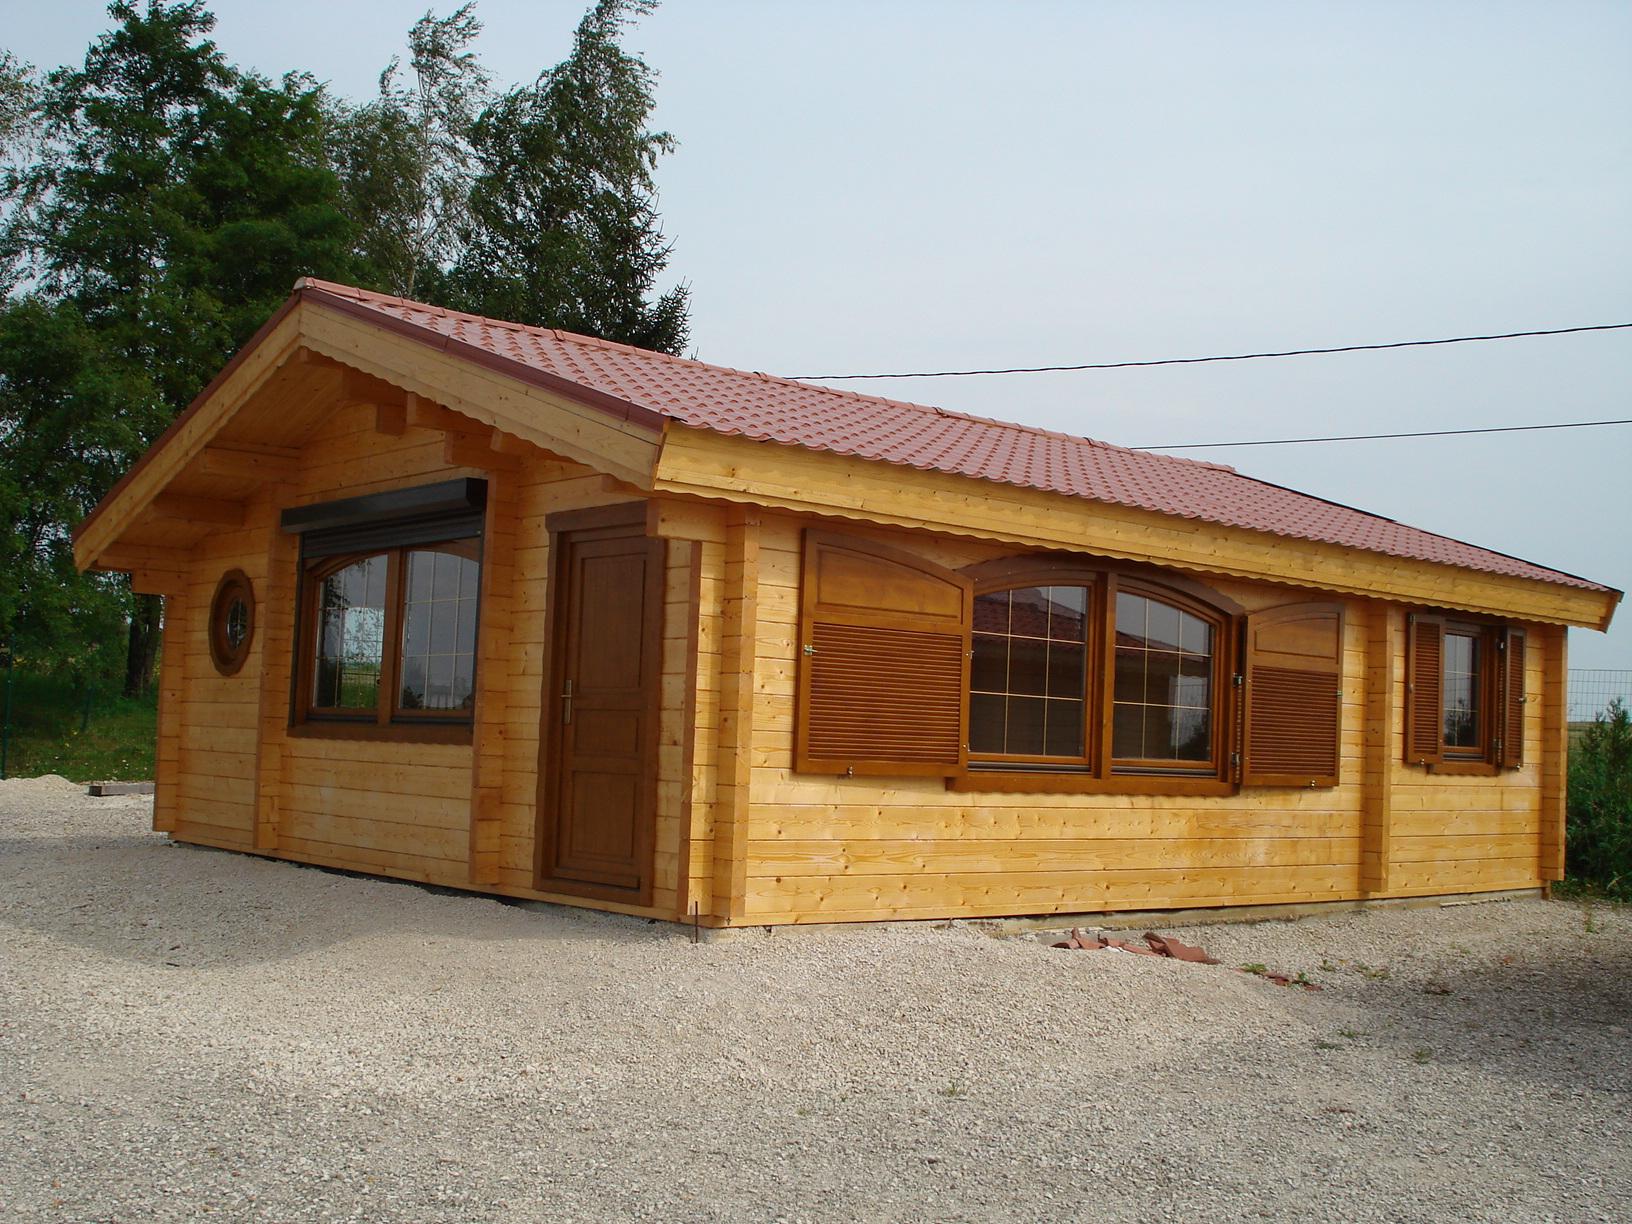 Chalet Habitable Jade | Chalet En Bois à Chalet En Kit Habitable